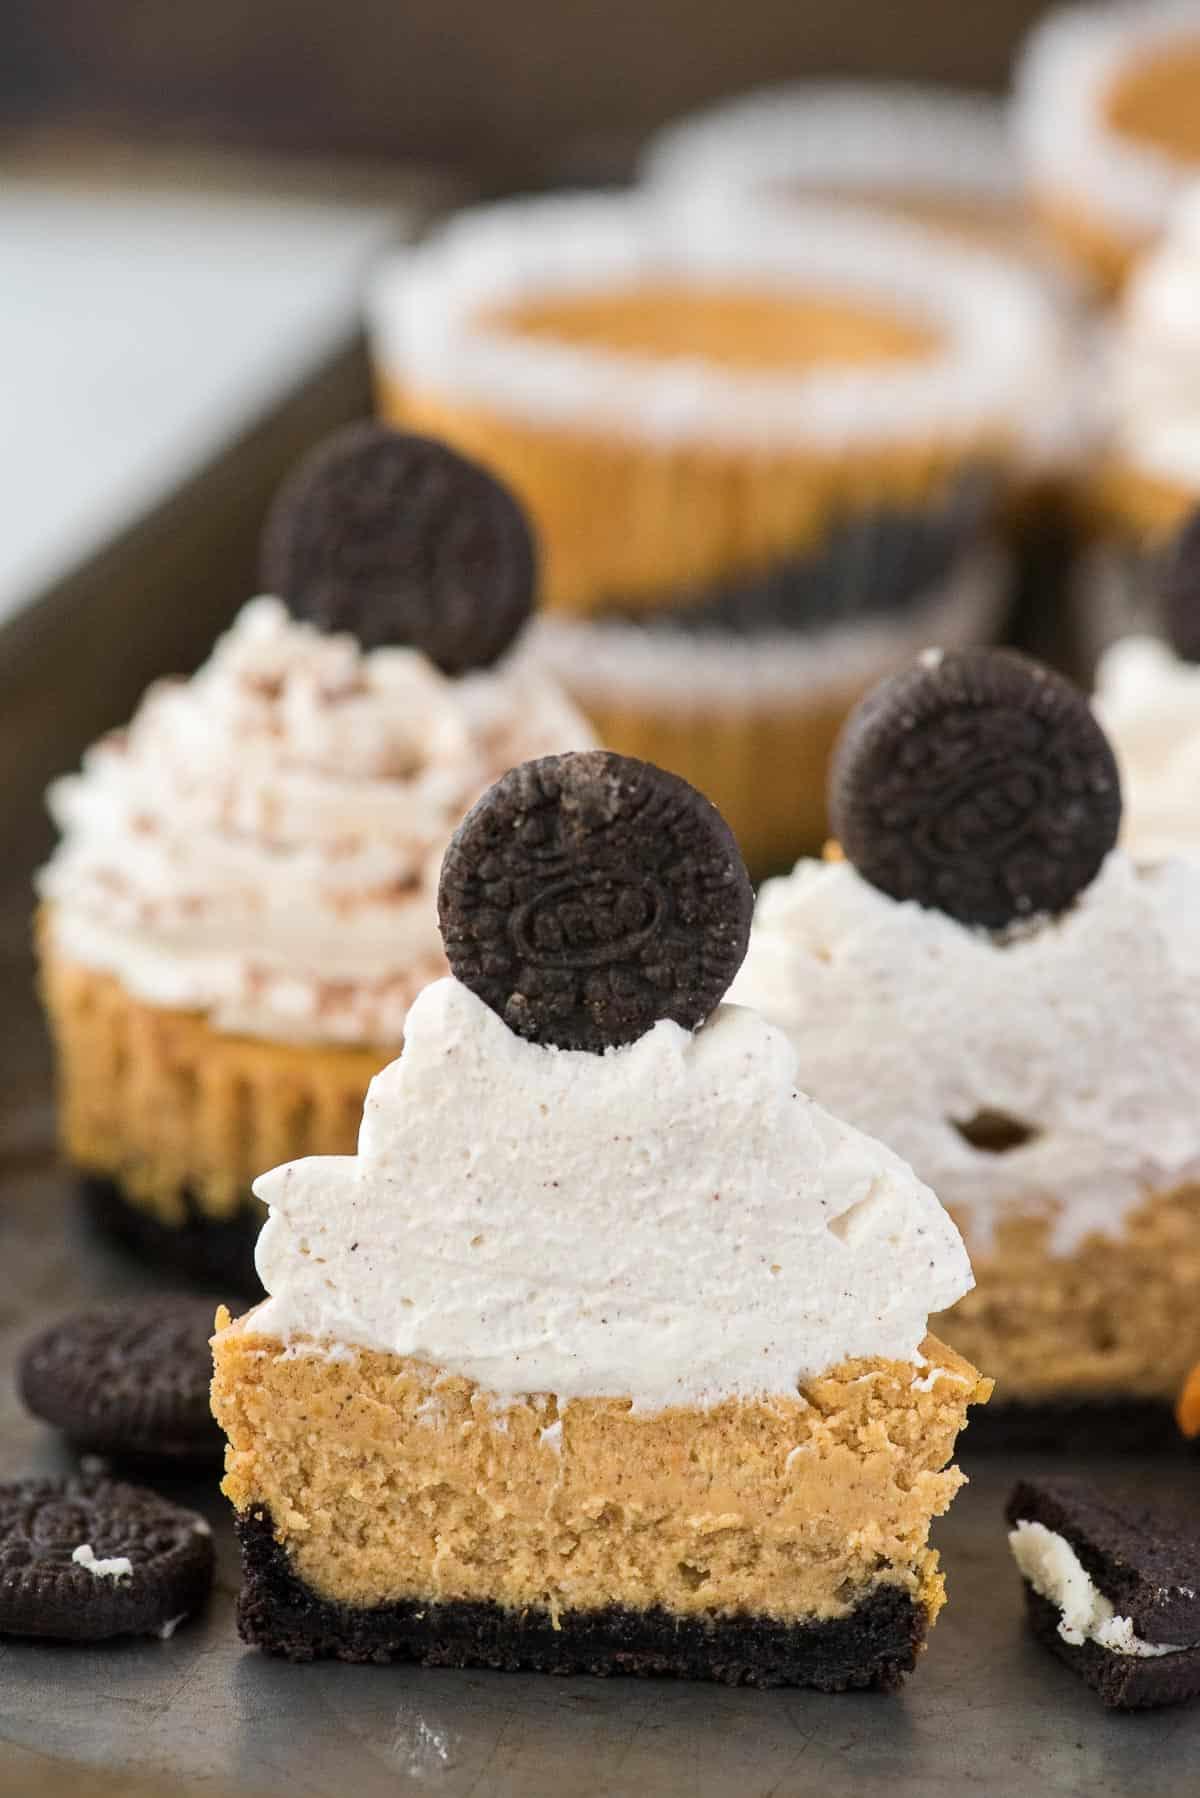 mini pumpkin cheesecake with oreo cookie crust cut in half